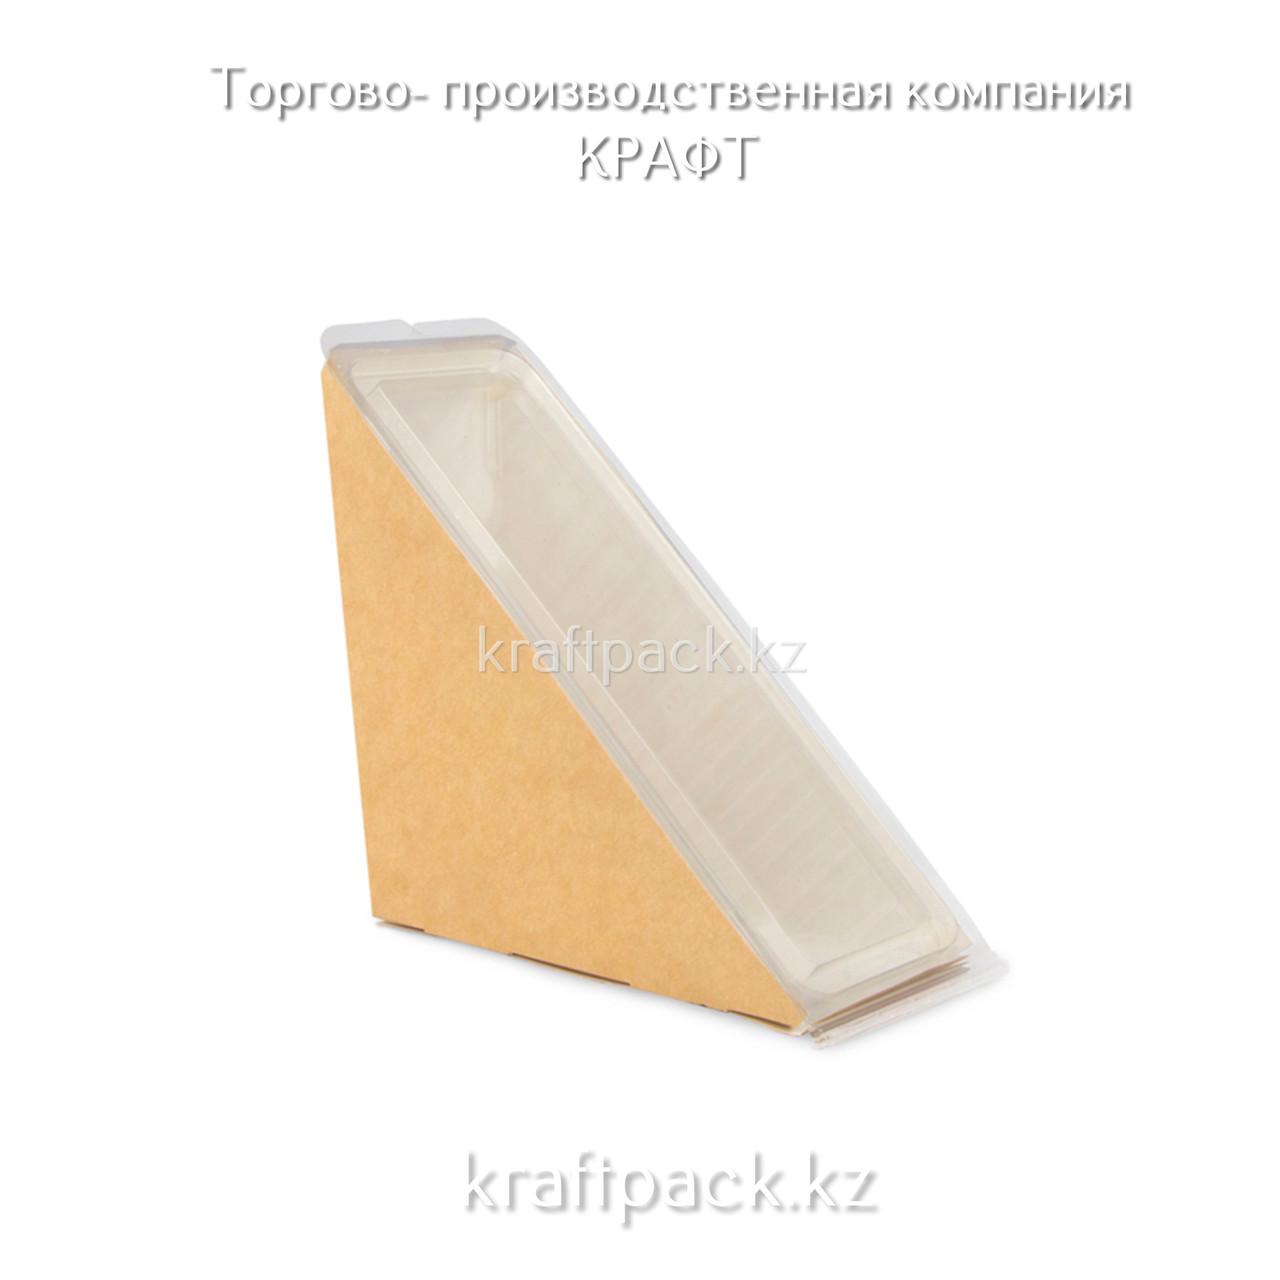 Упаковка ECO OpSandwich 60 для сэндвичей/бутербродов (25/700)